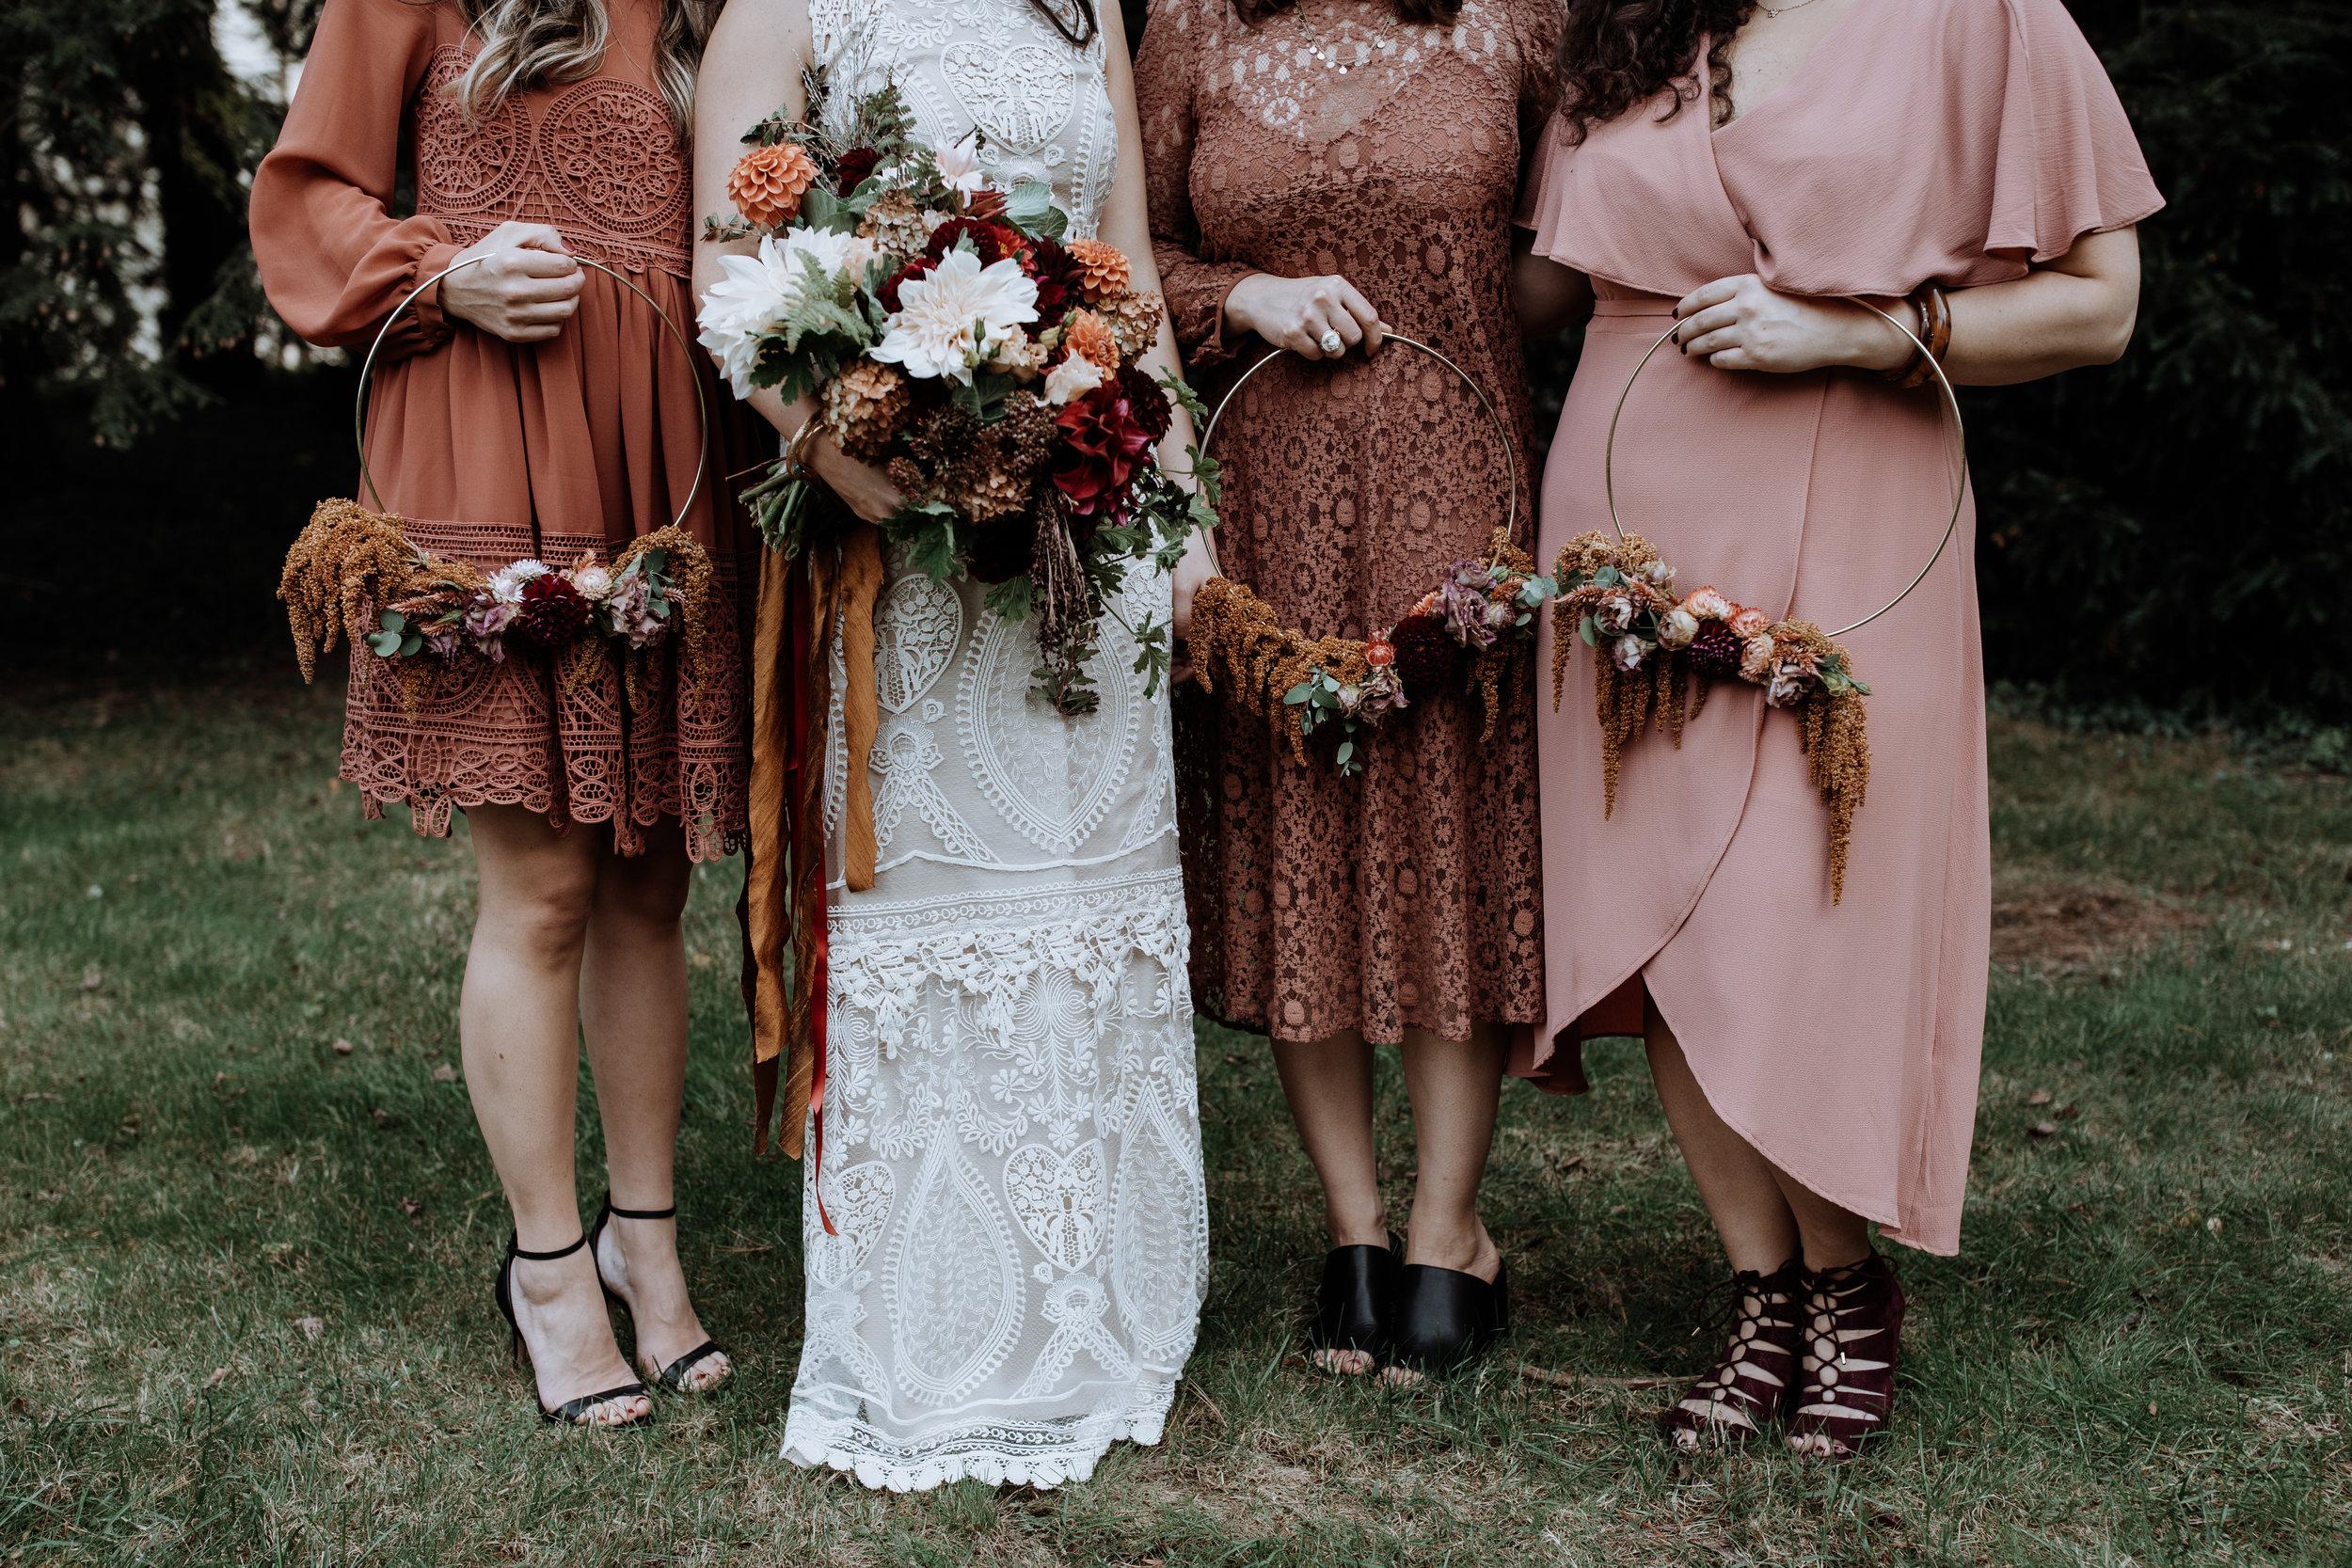 brideswomen dresses from ASOS and Zara